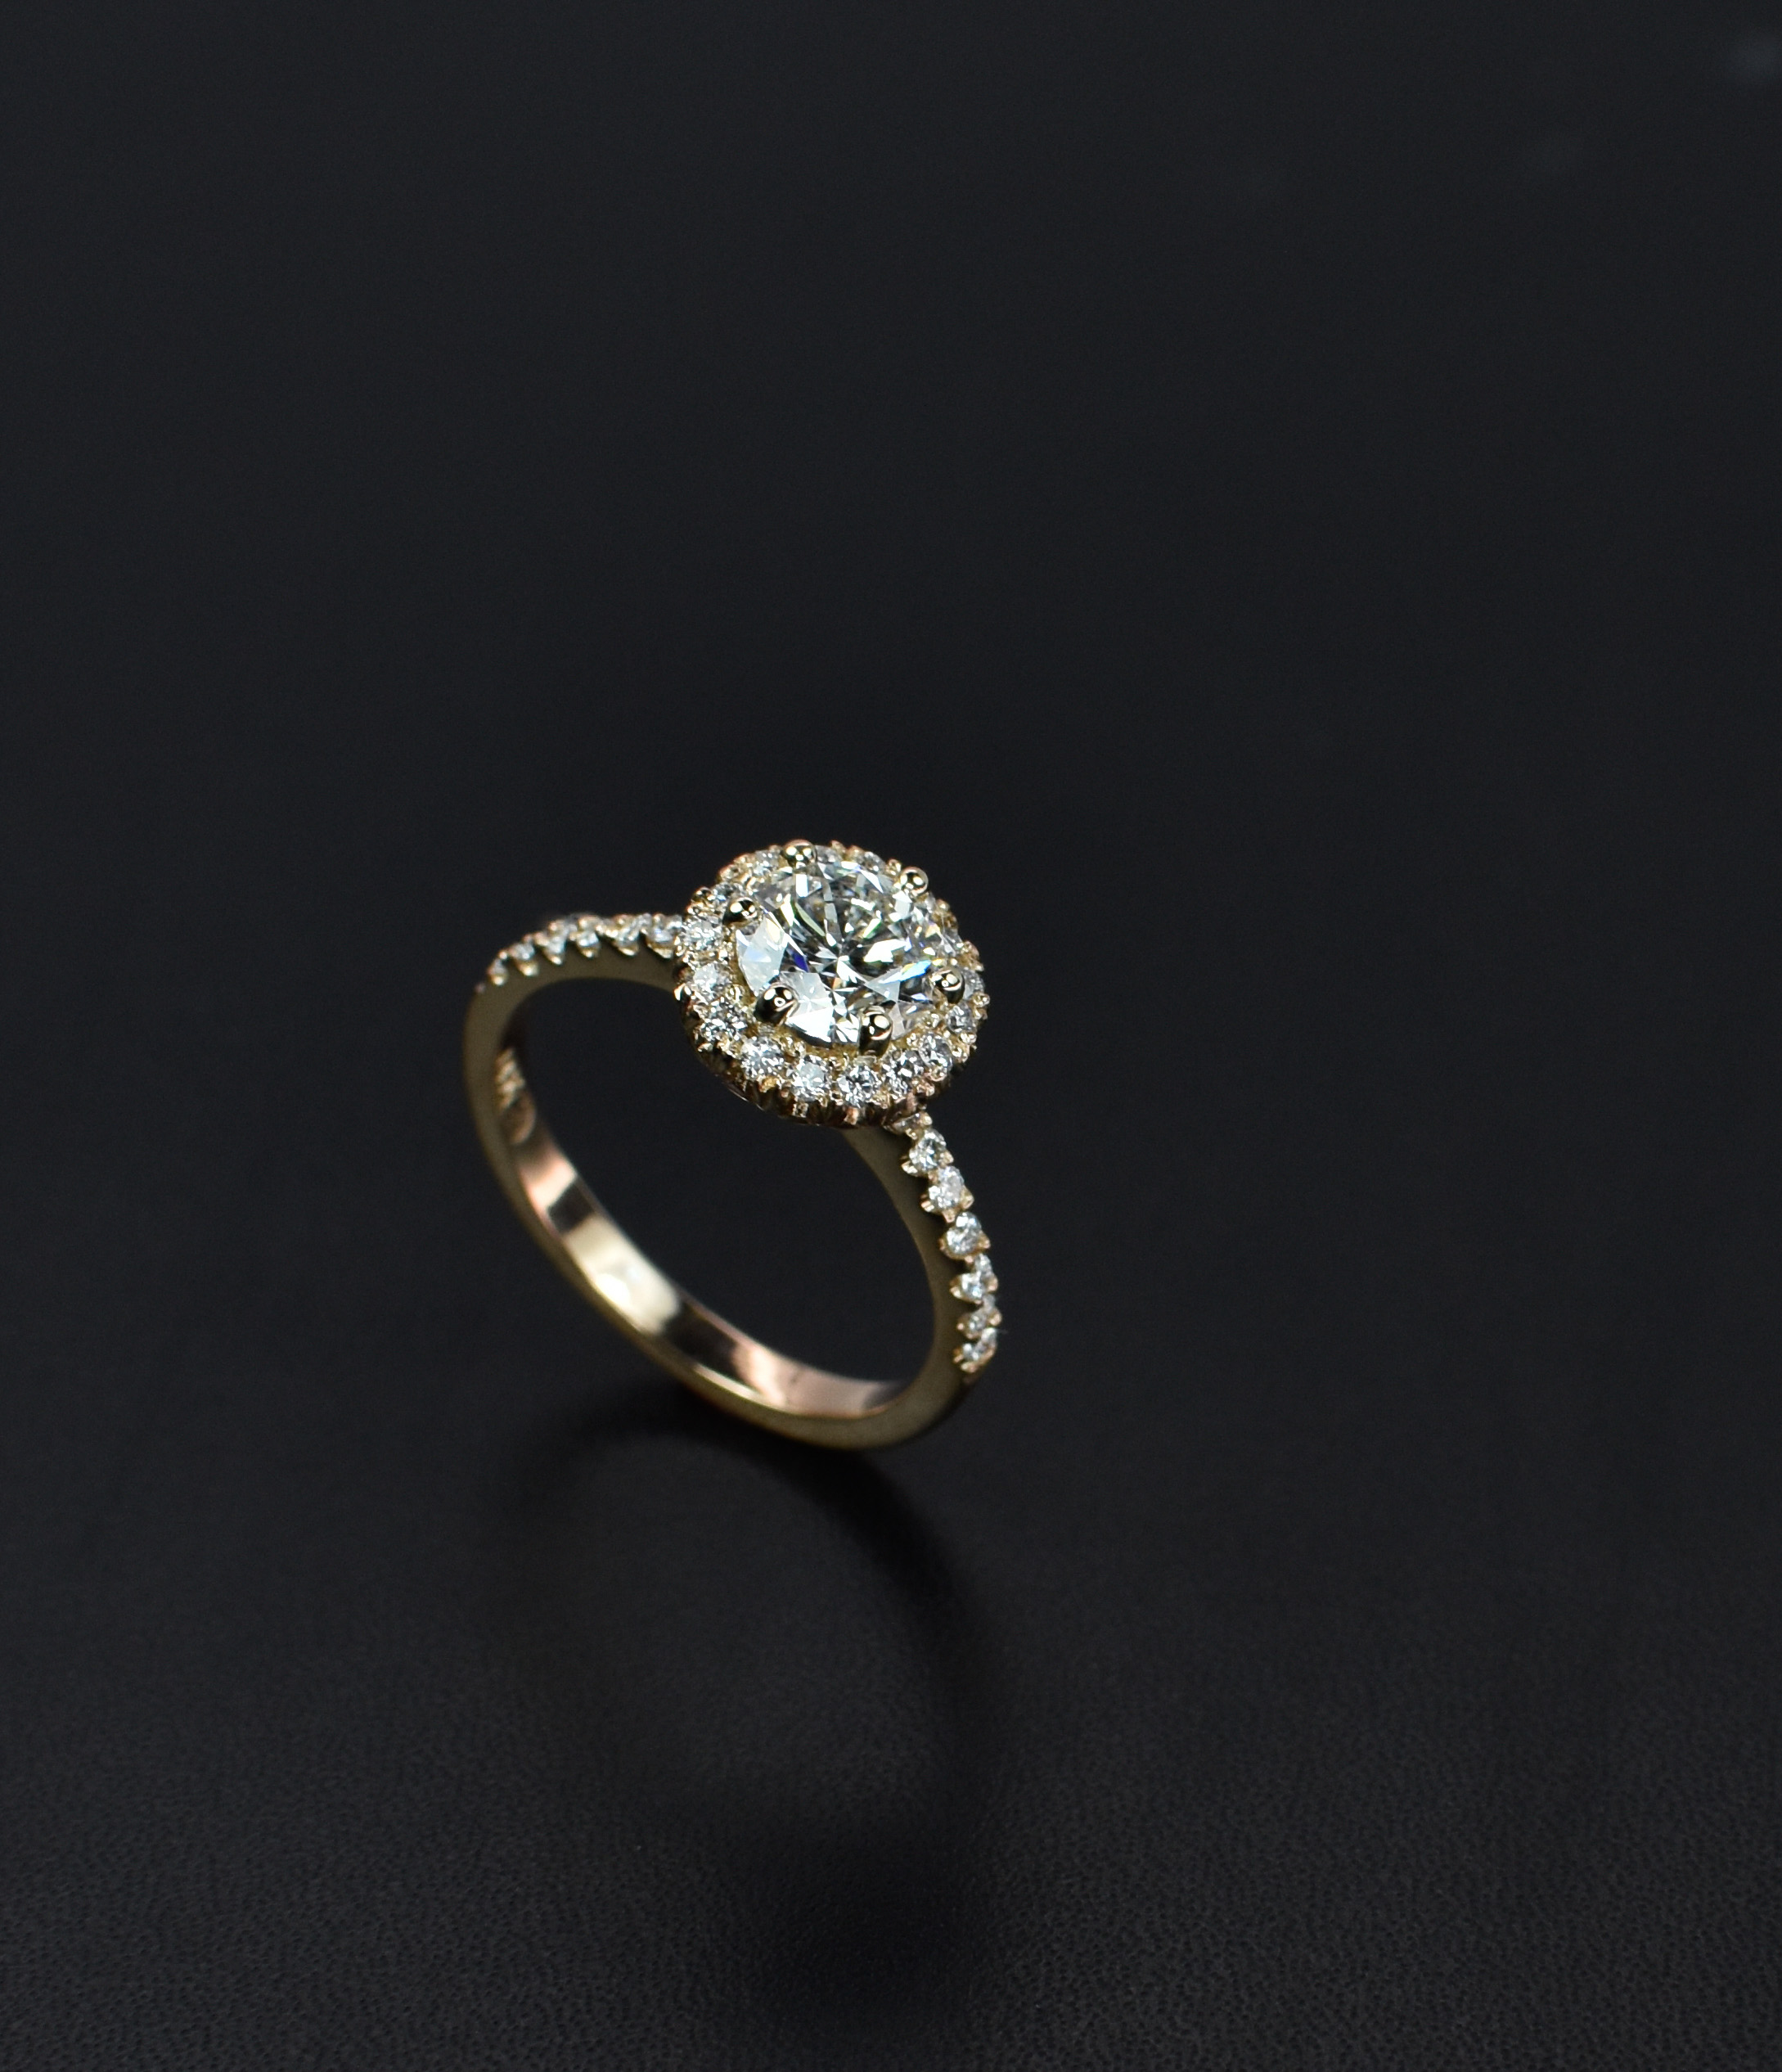 rose_gold_halo_engagement_ring_2.jpg